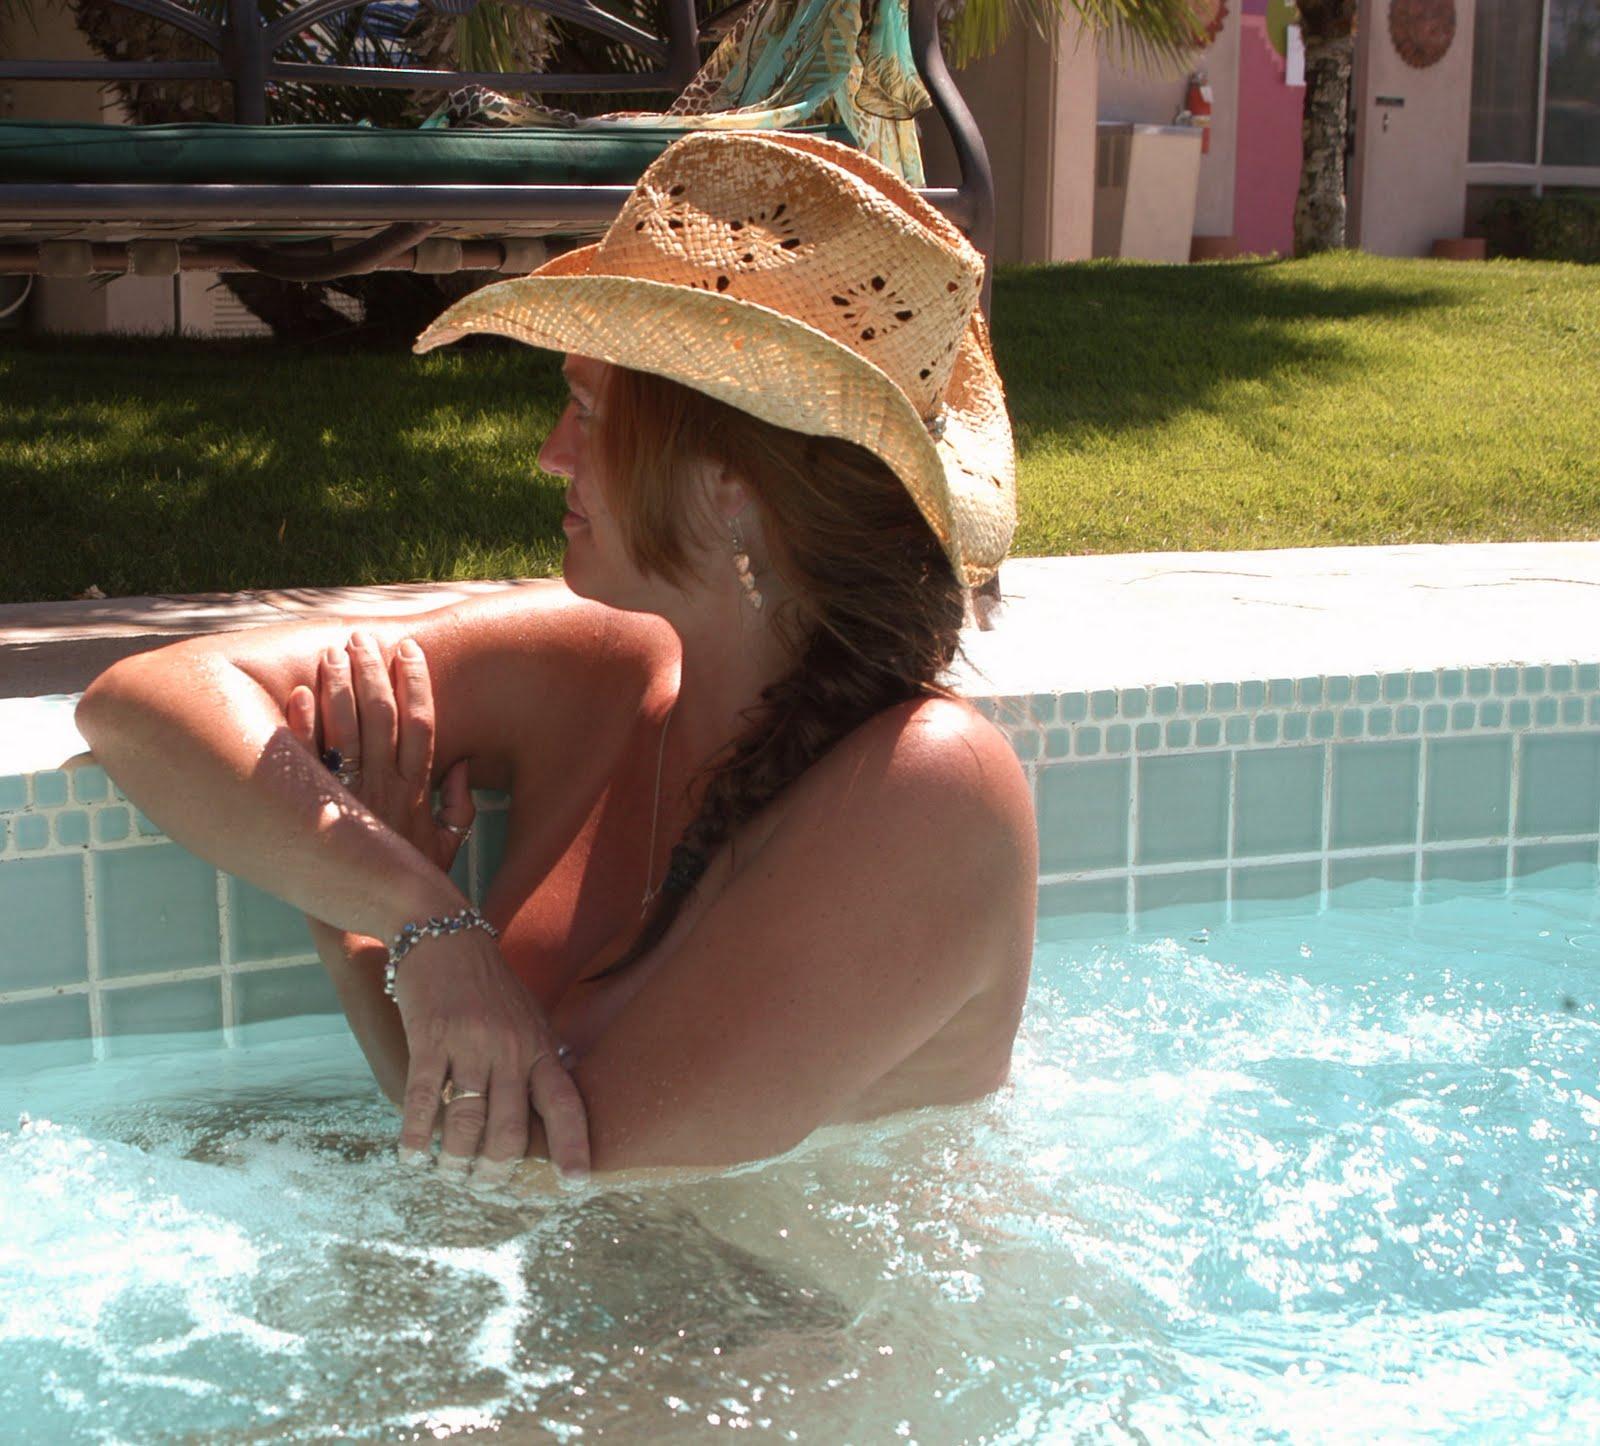 terra-cotta-inn-nudist-resort